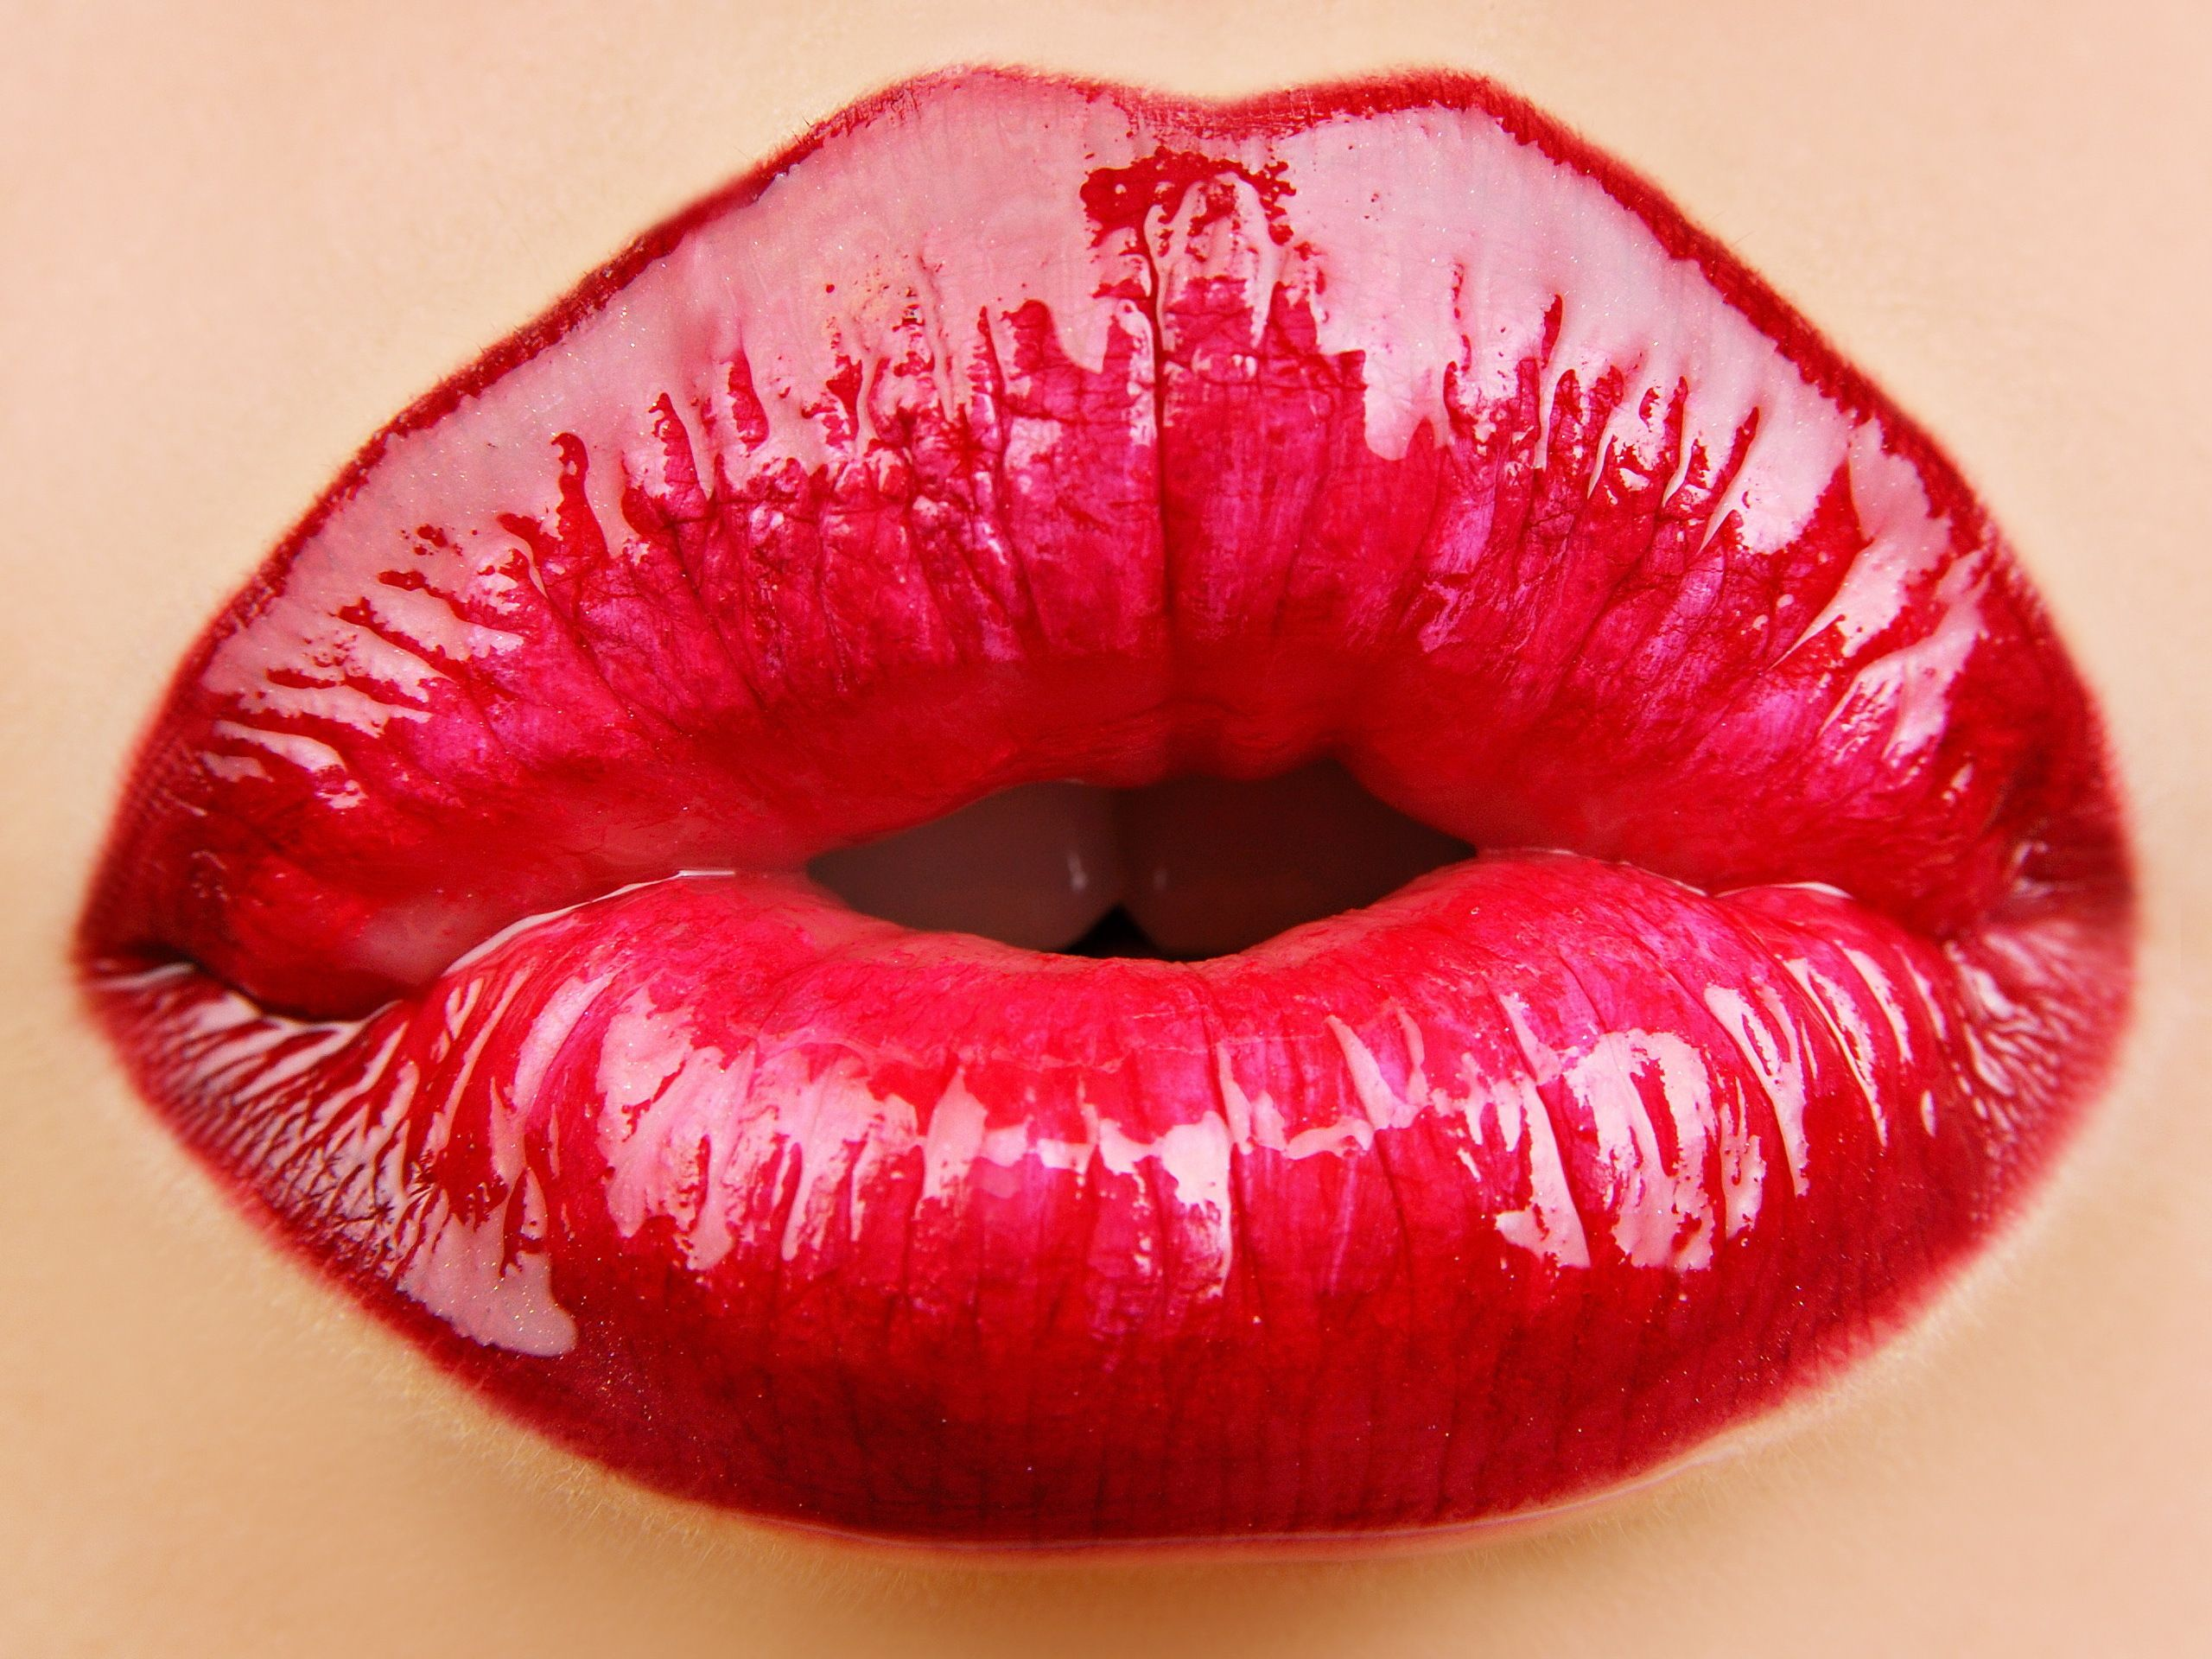 Pin Van Michael Ogle Op Glamor Me Roze Lippen Rode Lippen Kus